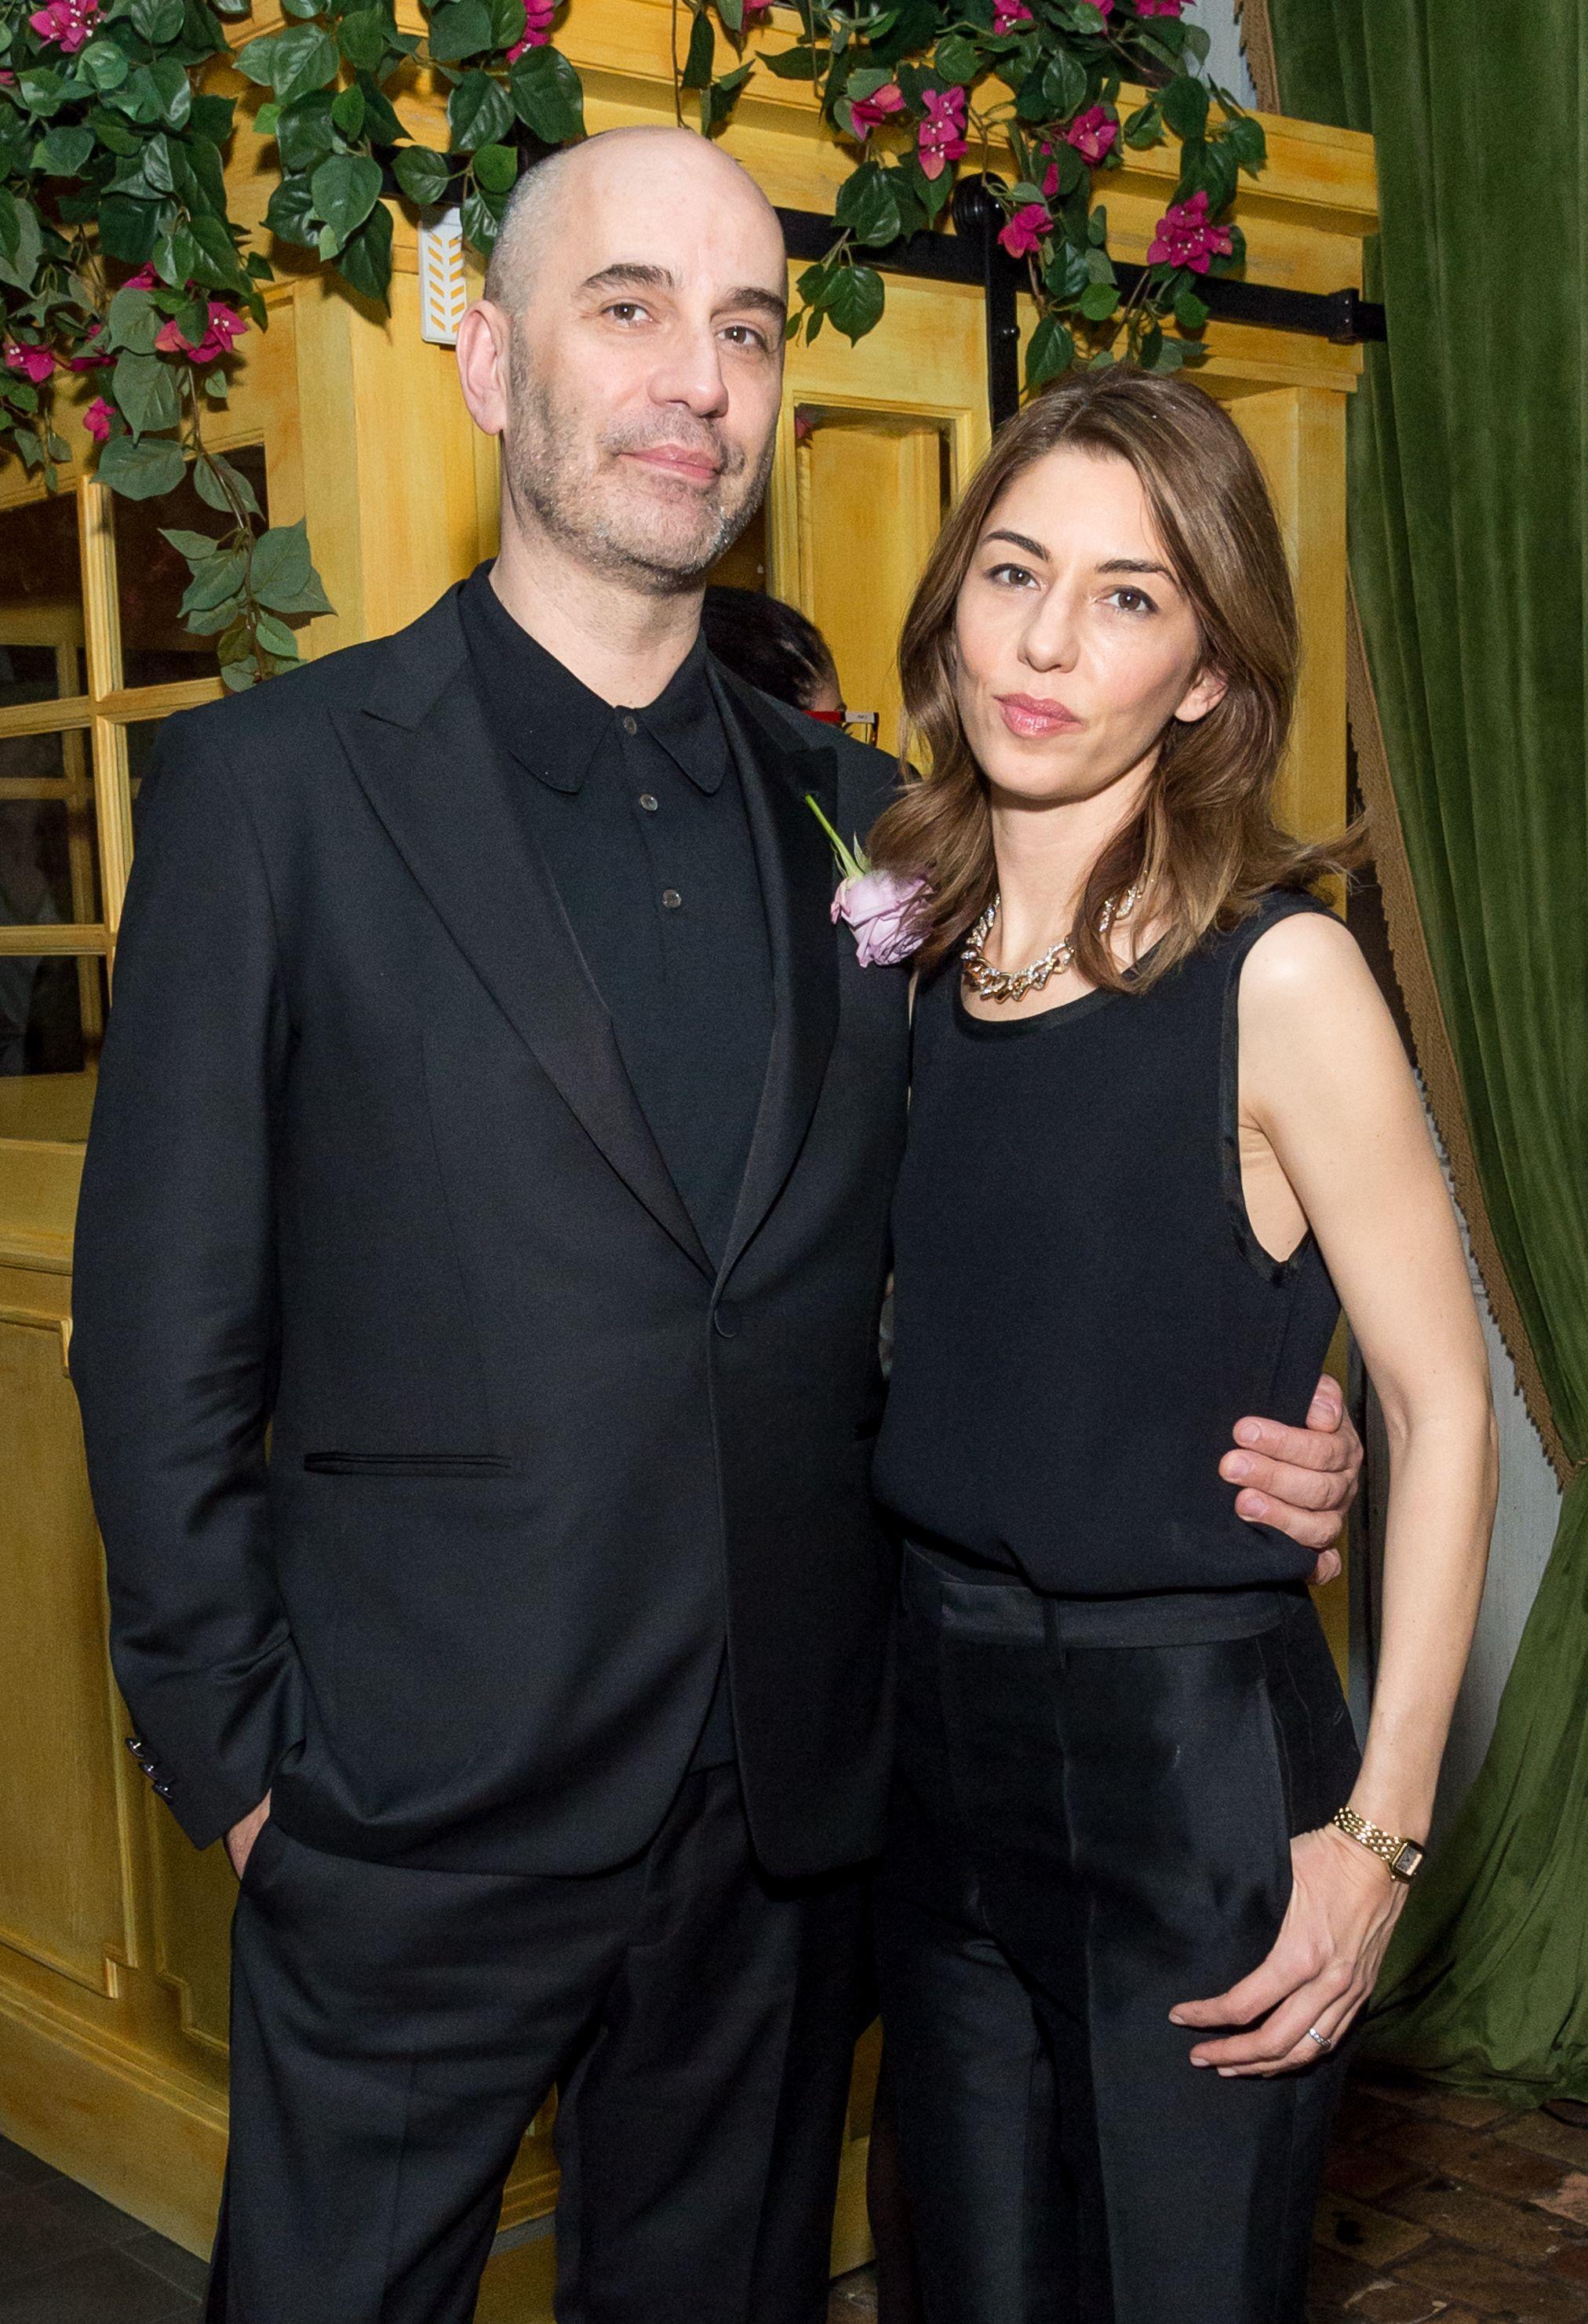 Fabrizio Viti and Sofia Coppola Fabrizio Viti Socialista Dinner, New York, USA - 29 Nov 2017